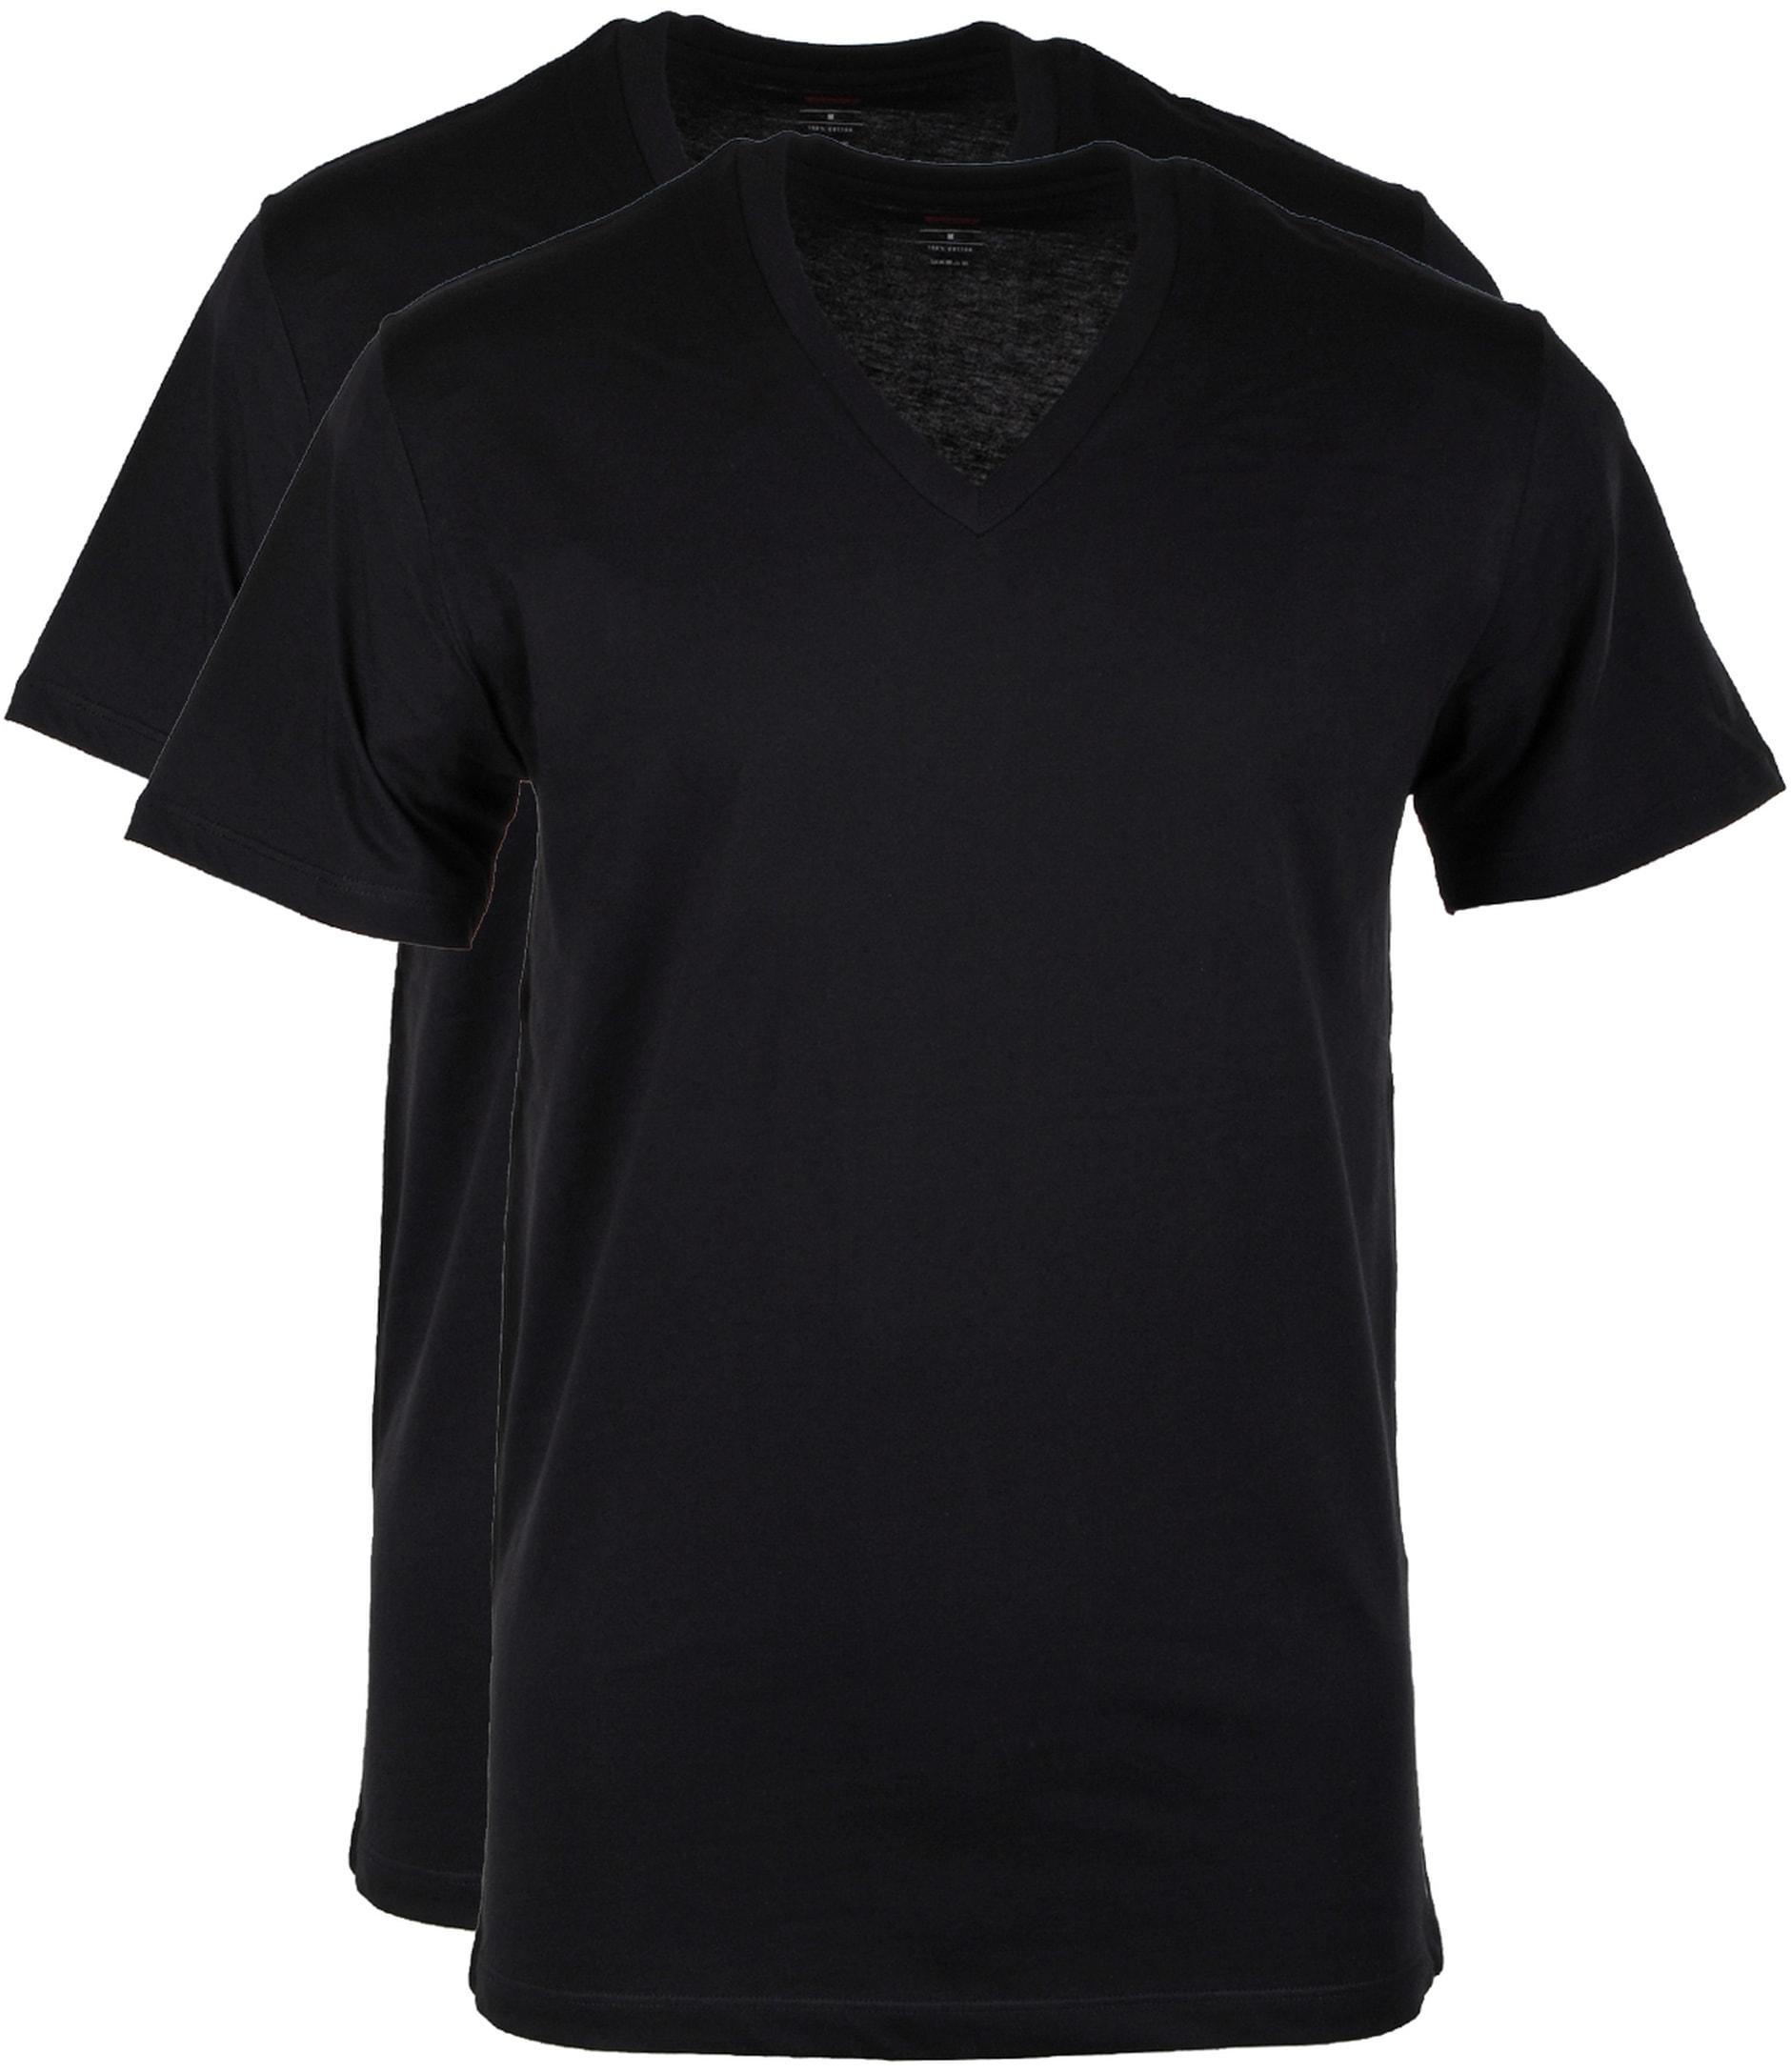 Levi's T-shirt V-Neck Black 2-Pack foto 0